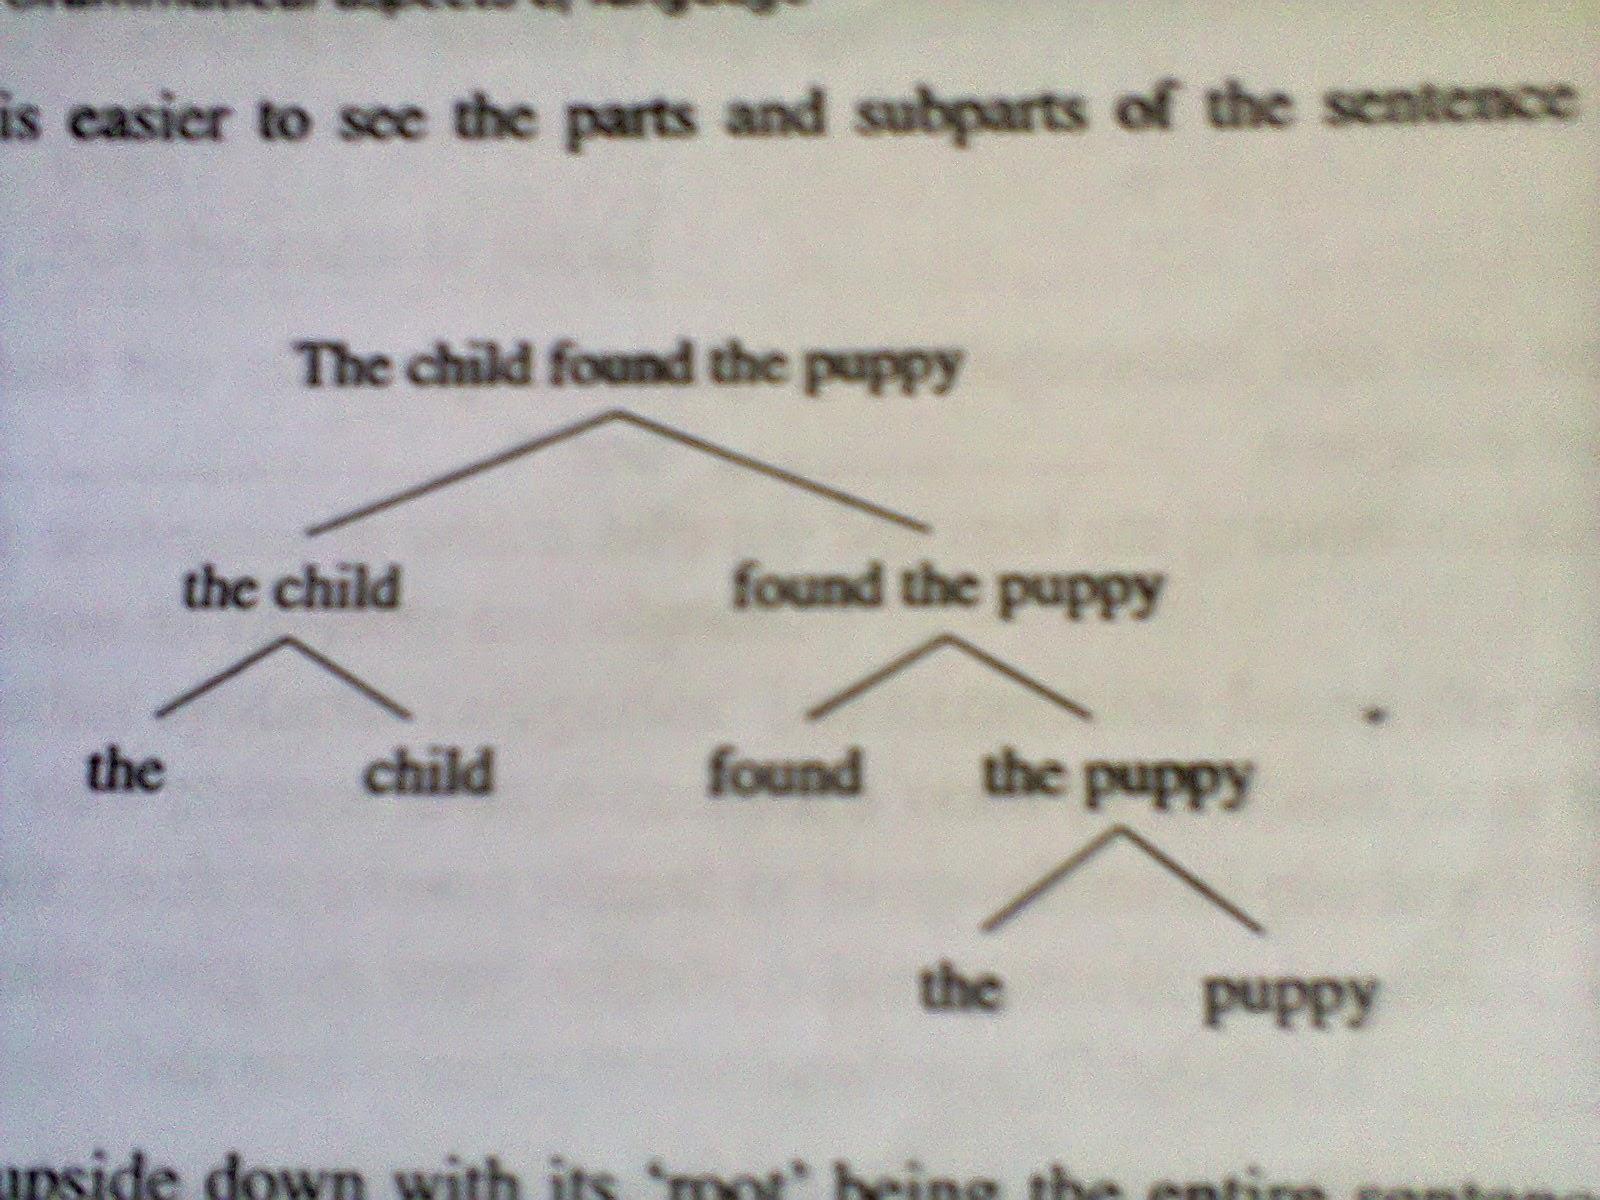 Diagramming Sentences Rules 2005 Jeep Wrangler Fuse Box Diagram Sentence Structure